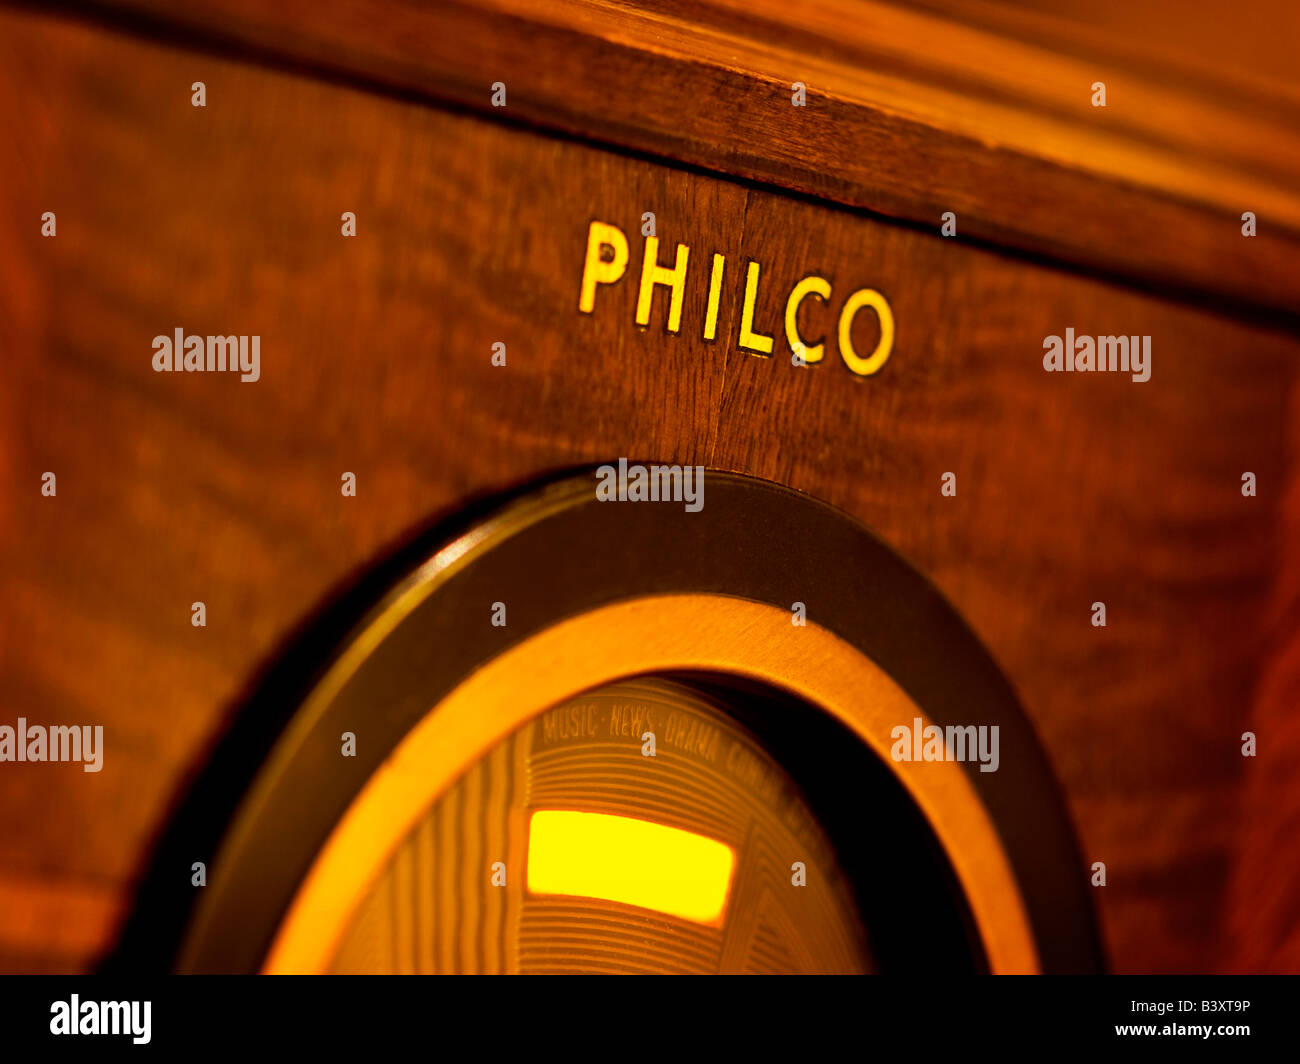 Old time Philco Radio - Stock Image